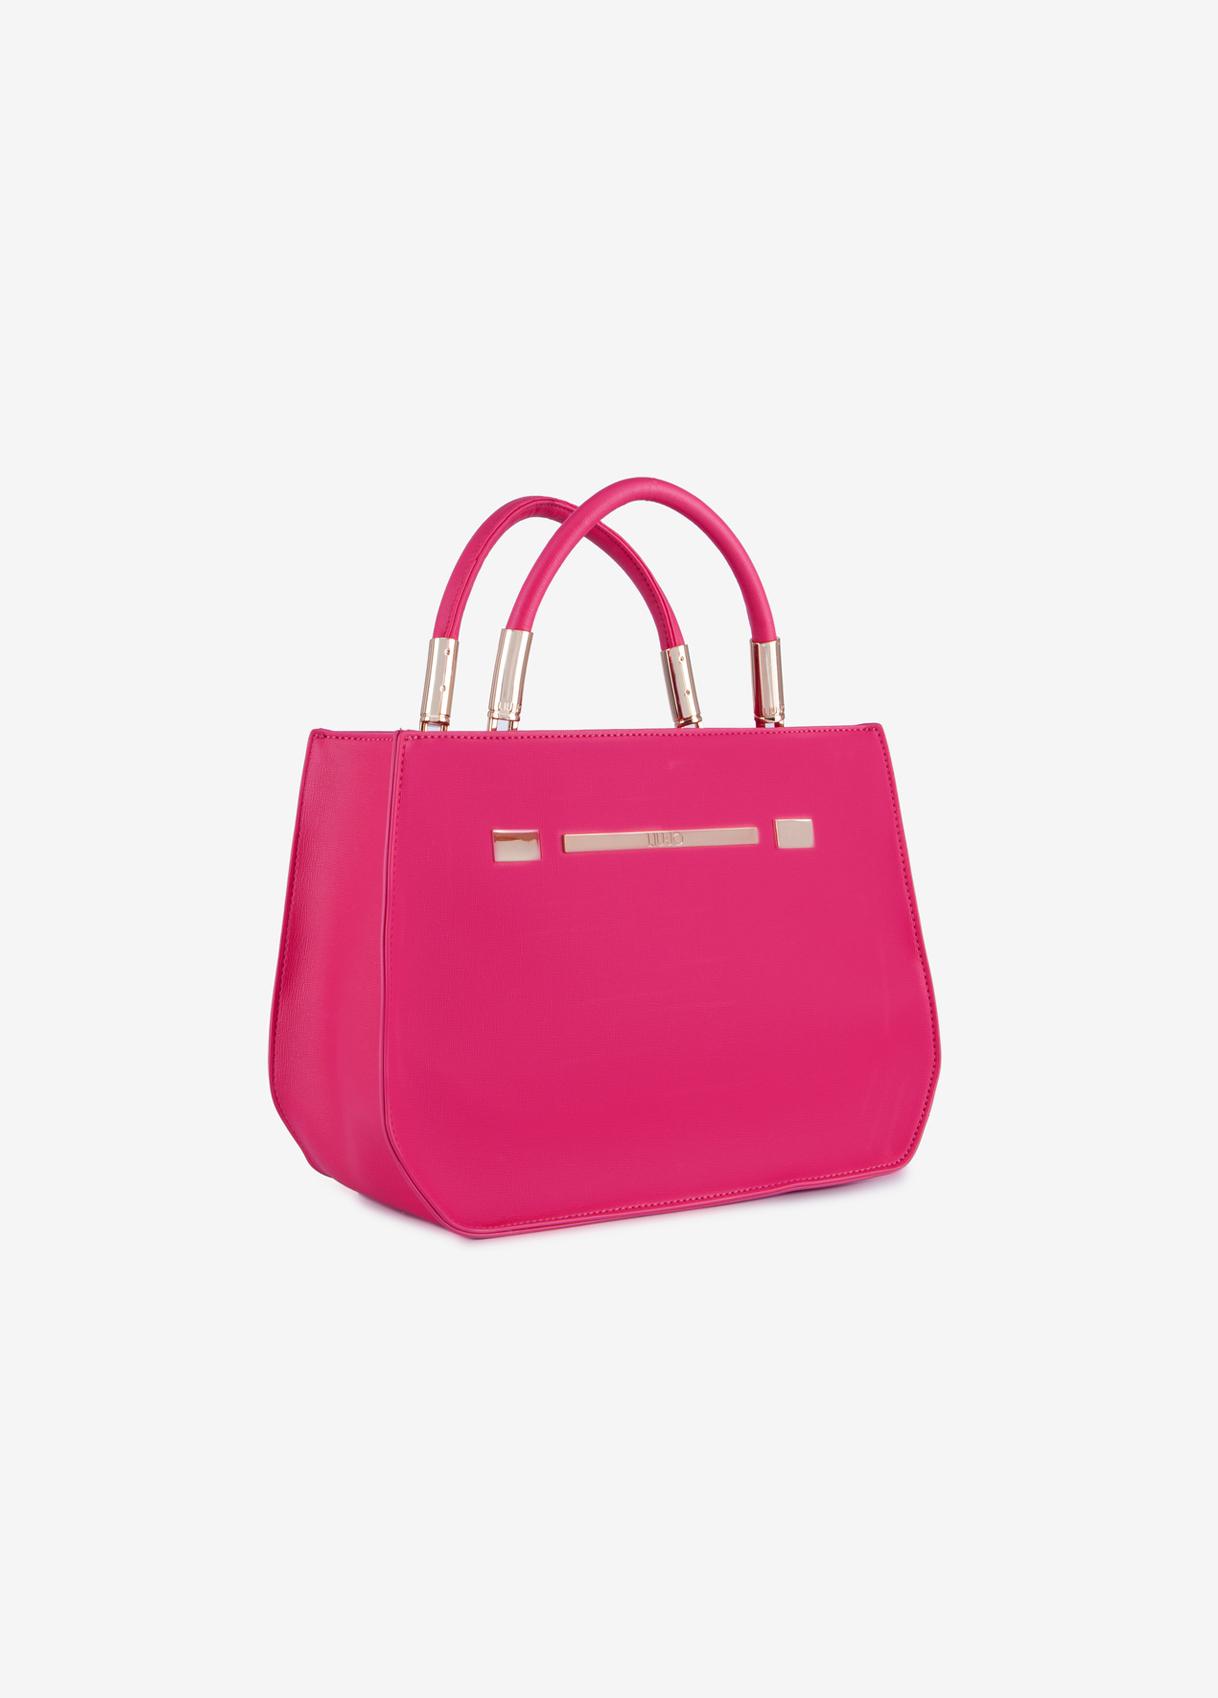 LIU JO-Bags-Bowlingbags-A19147E008781945-S-AL-B-R-03-N